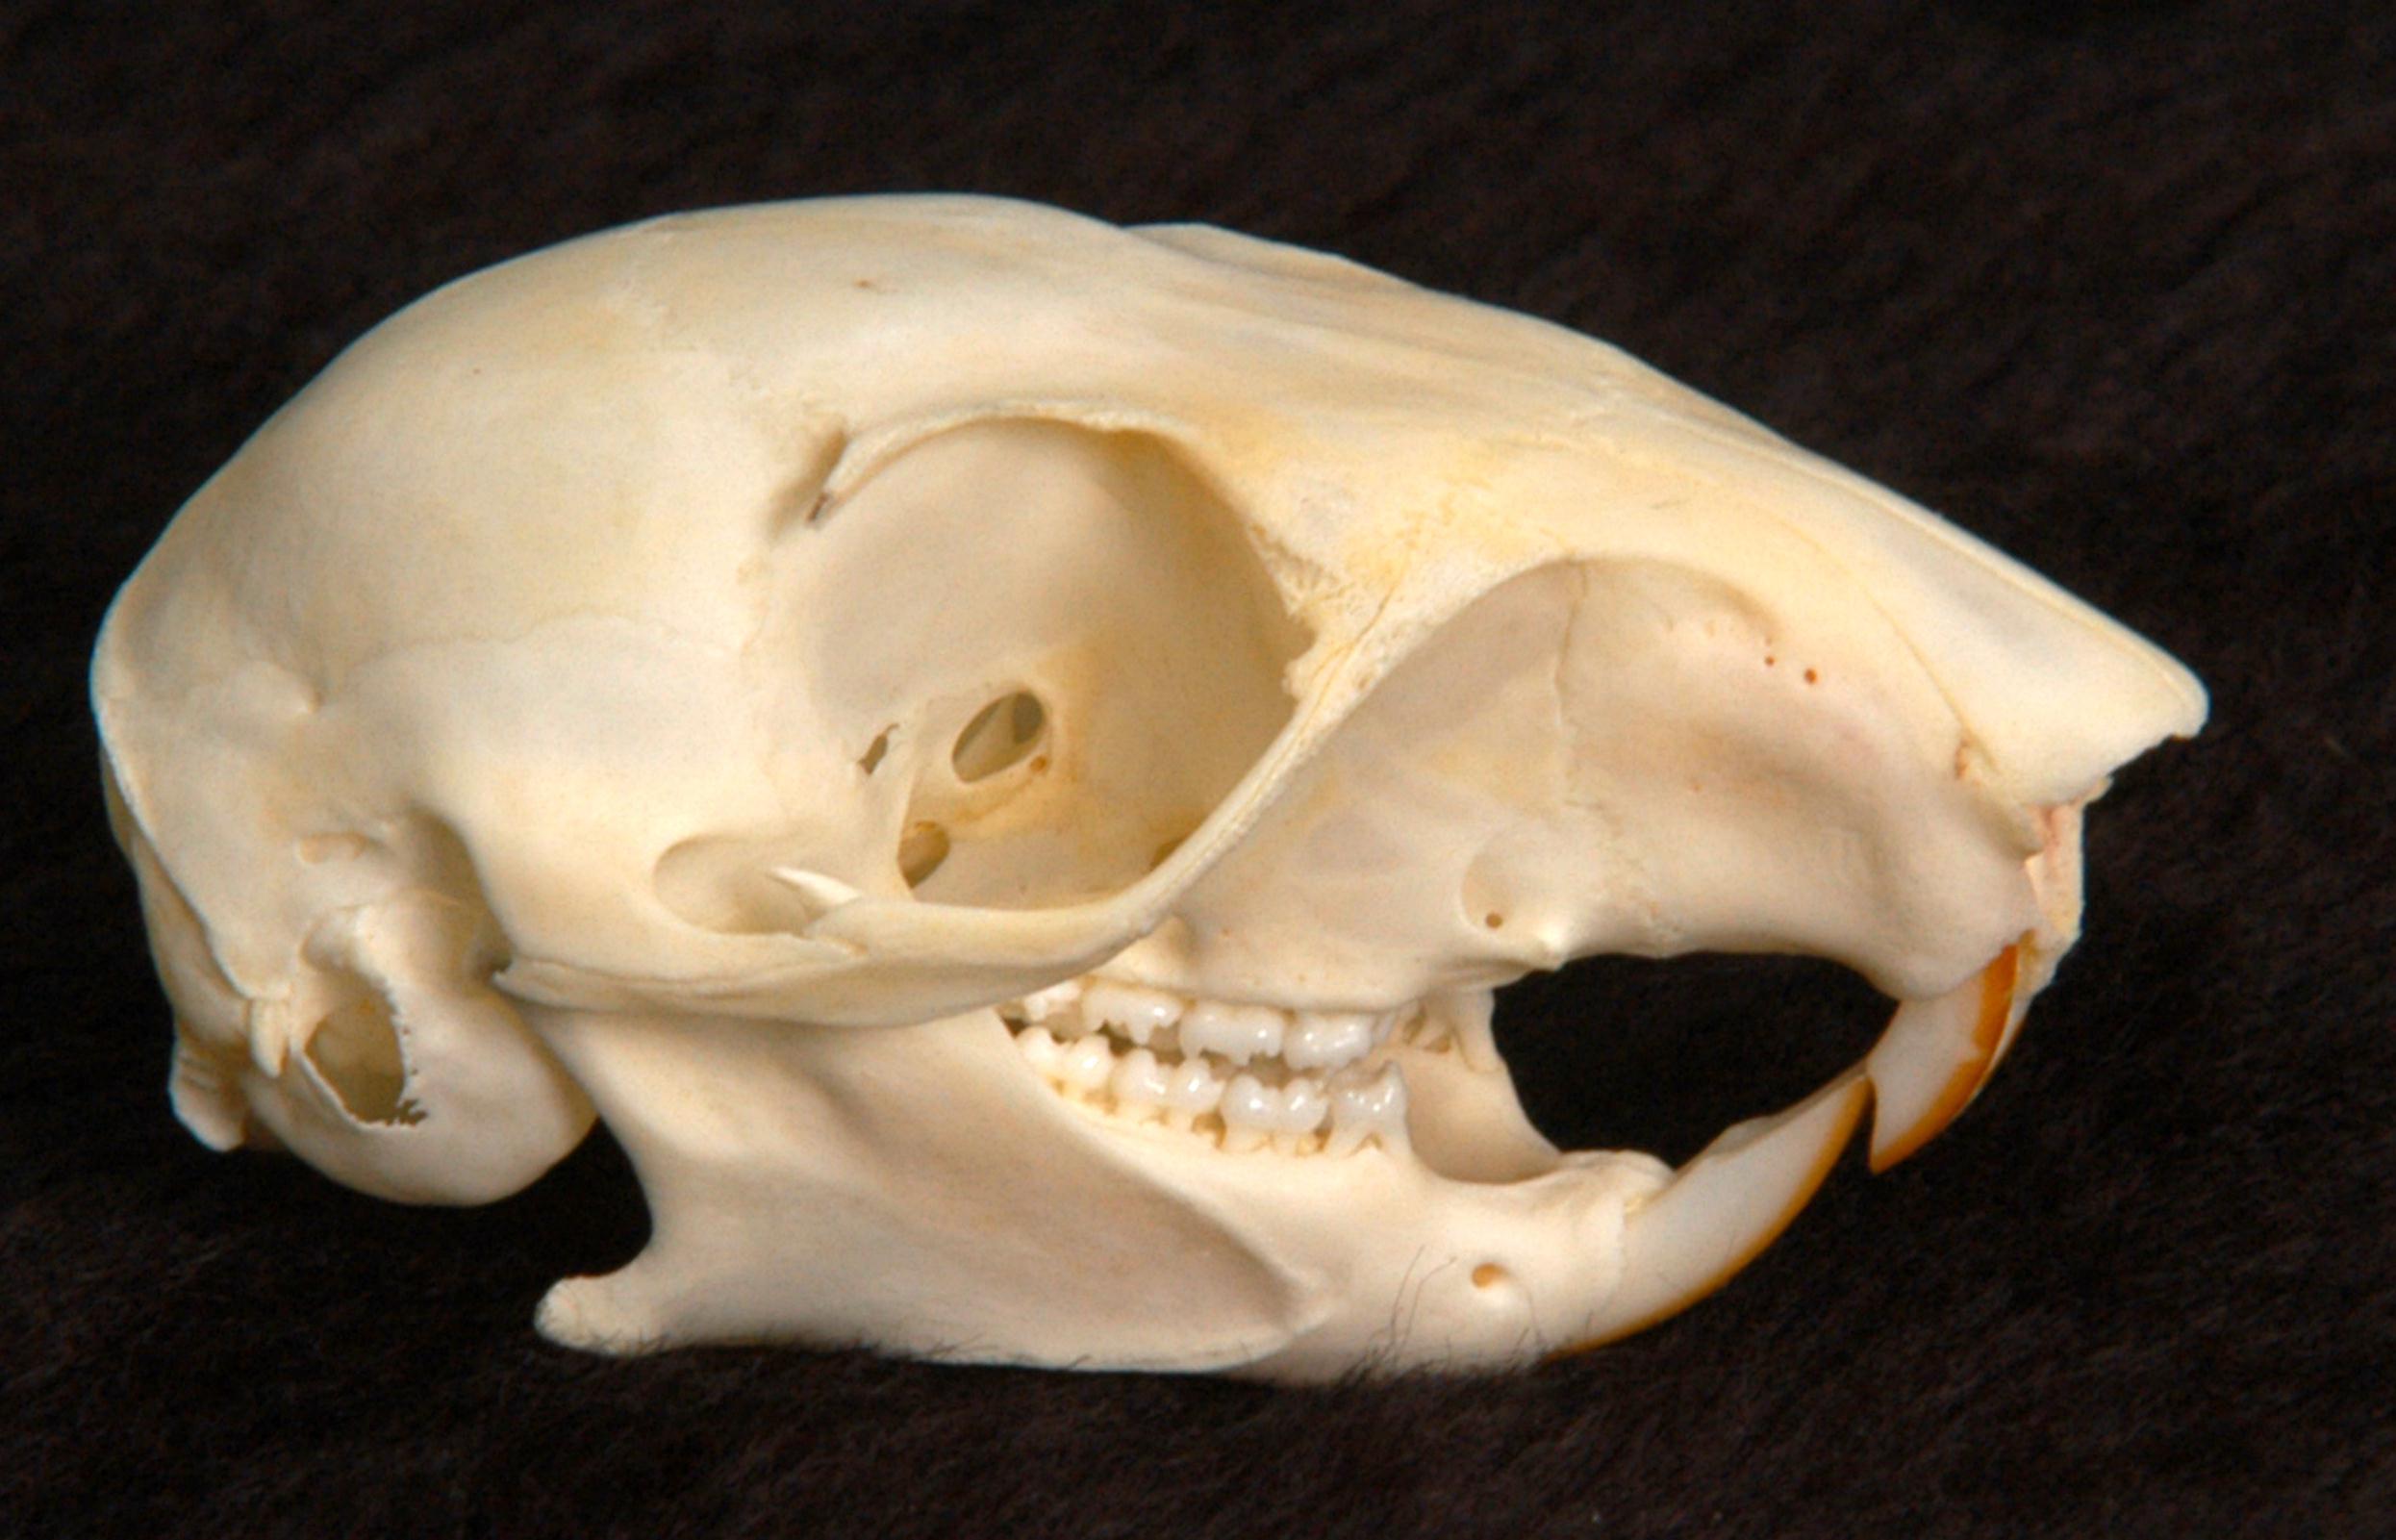 Skulls Of Mamals And Dentla Formulas Flashcards By ProProfs